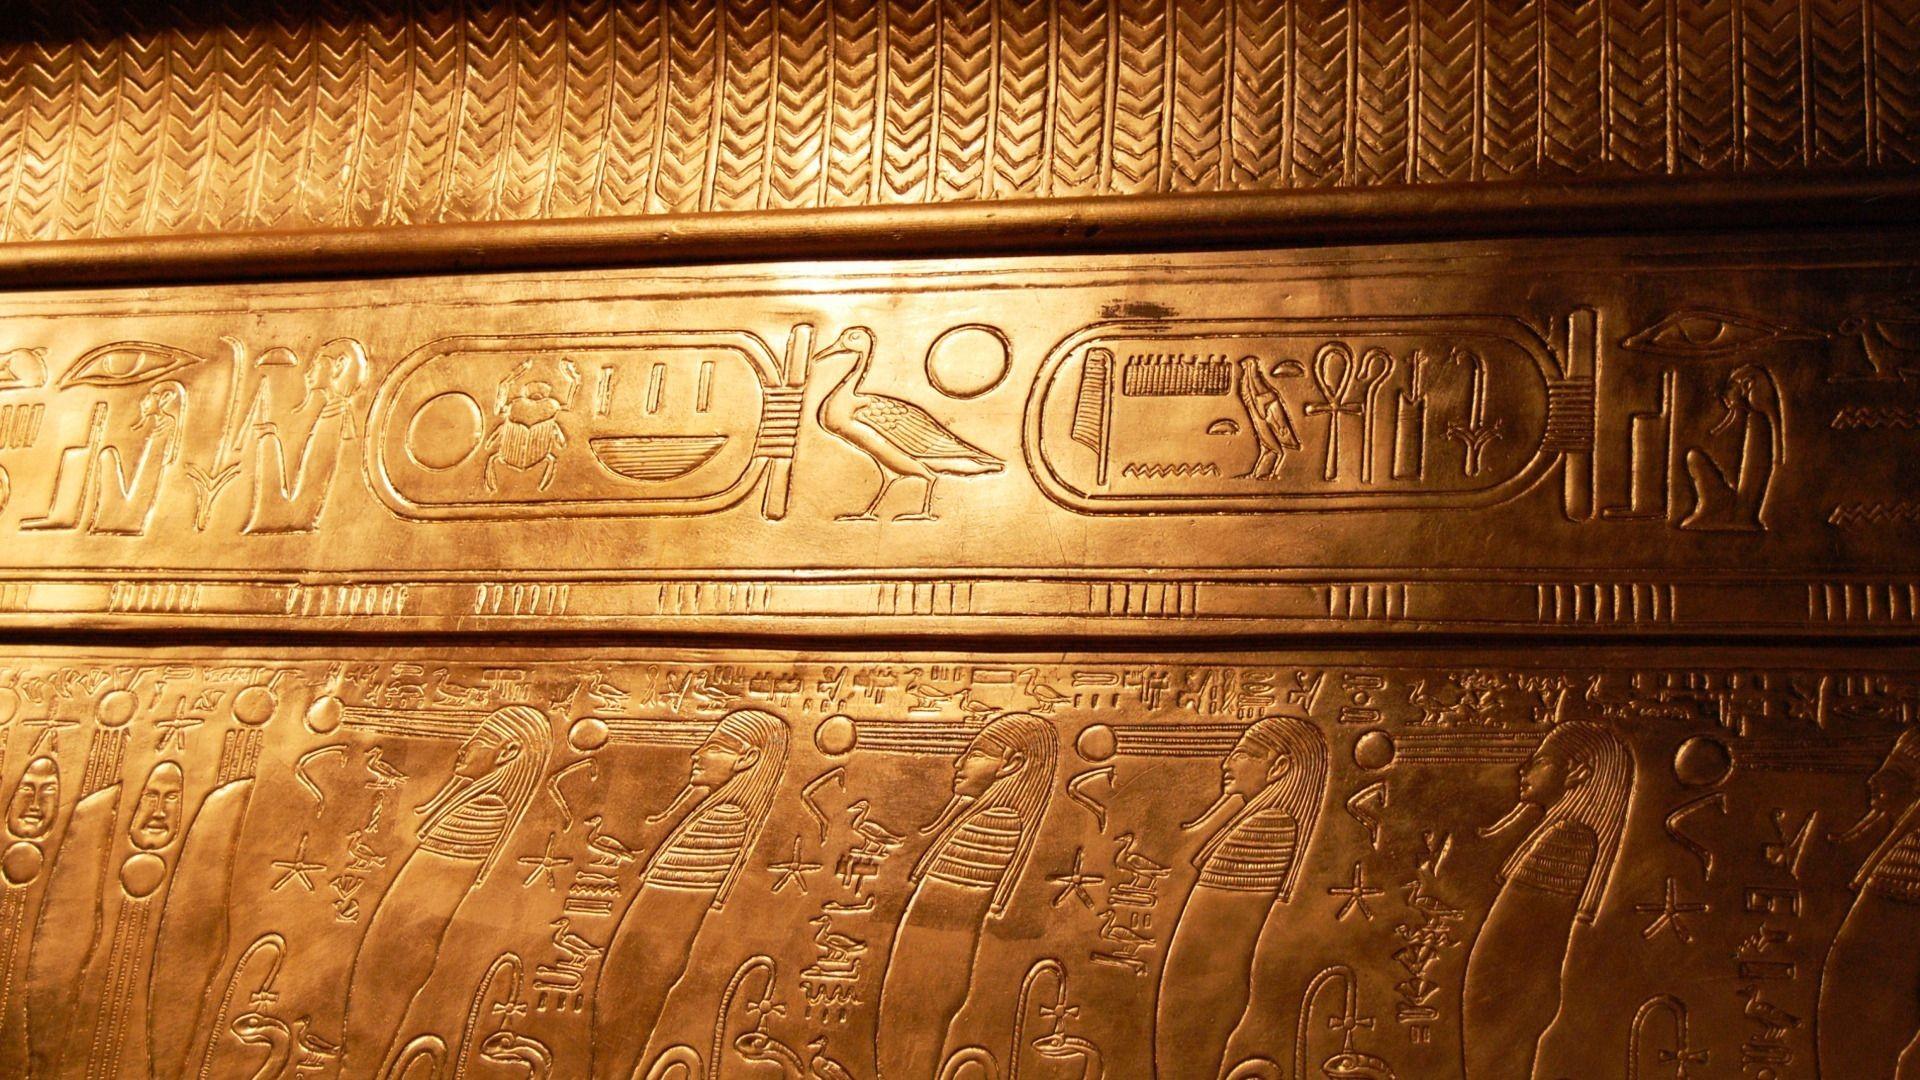 Egyptian Hieroglyphics Wallpaper.